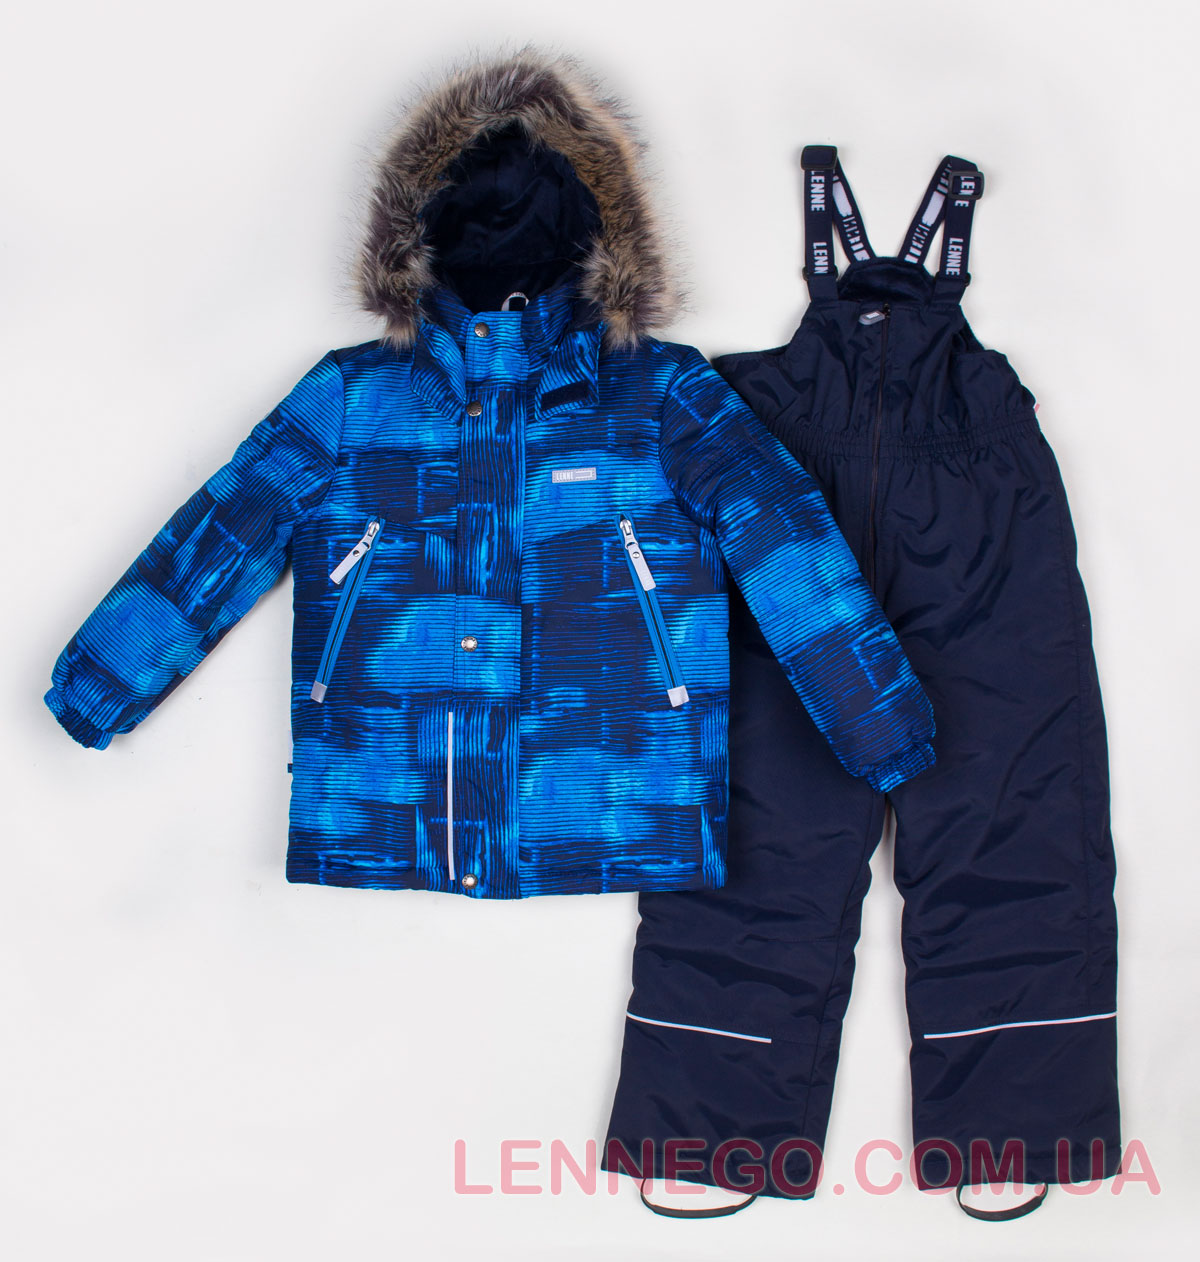 Lenne CIty+Jack комплект для мальчика синий